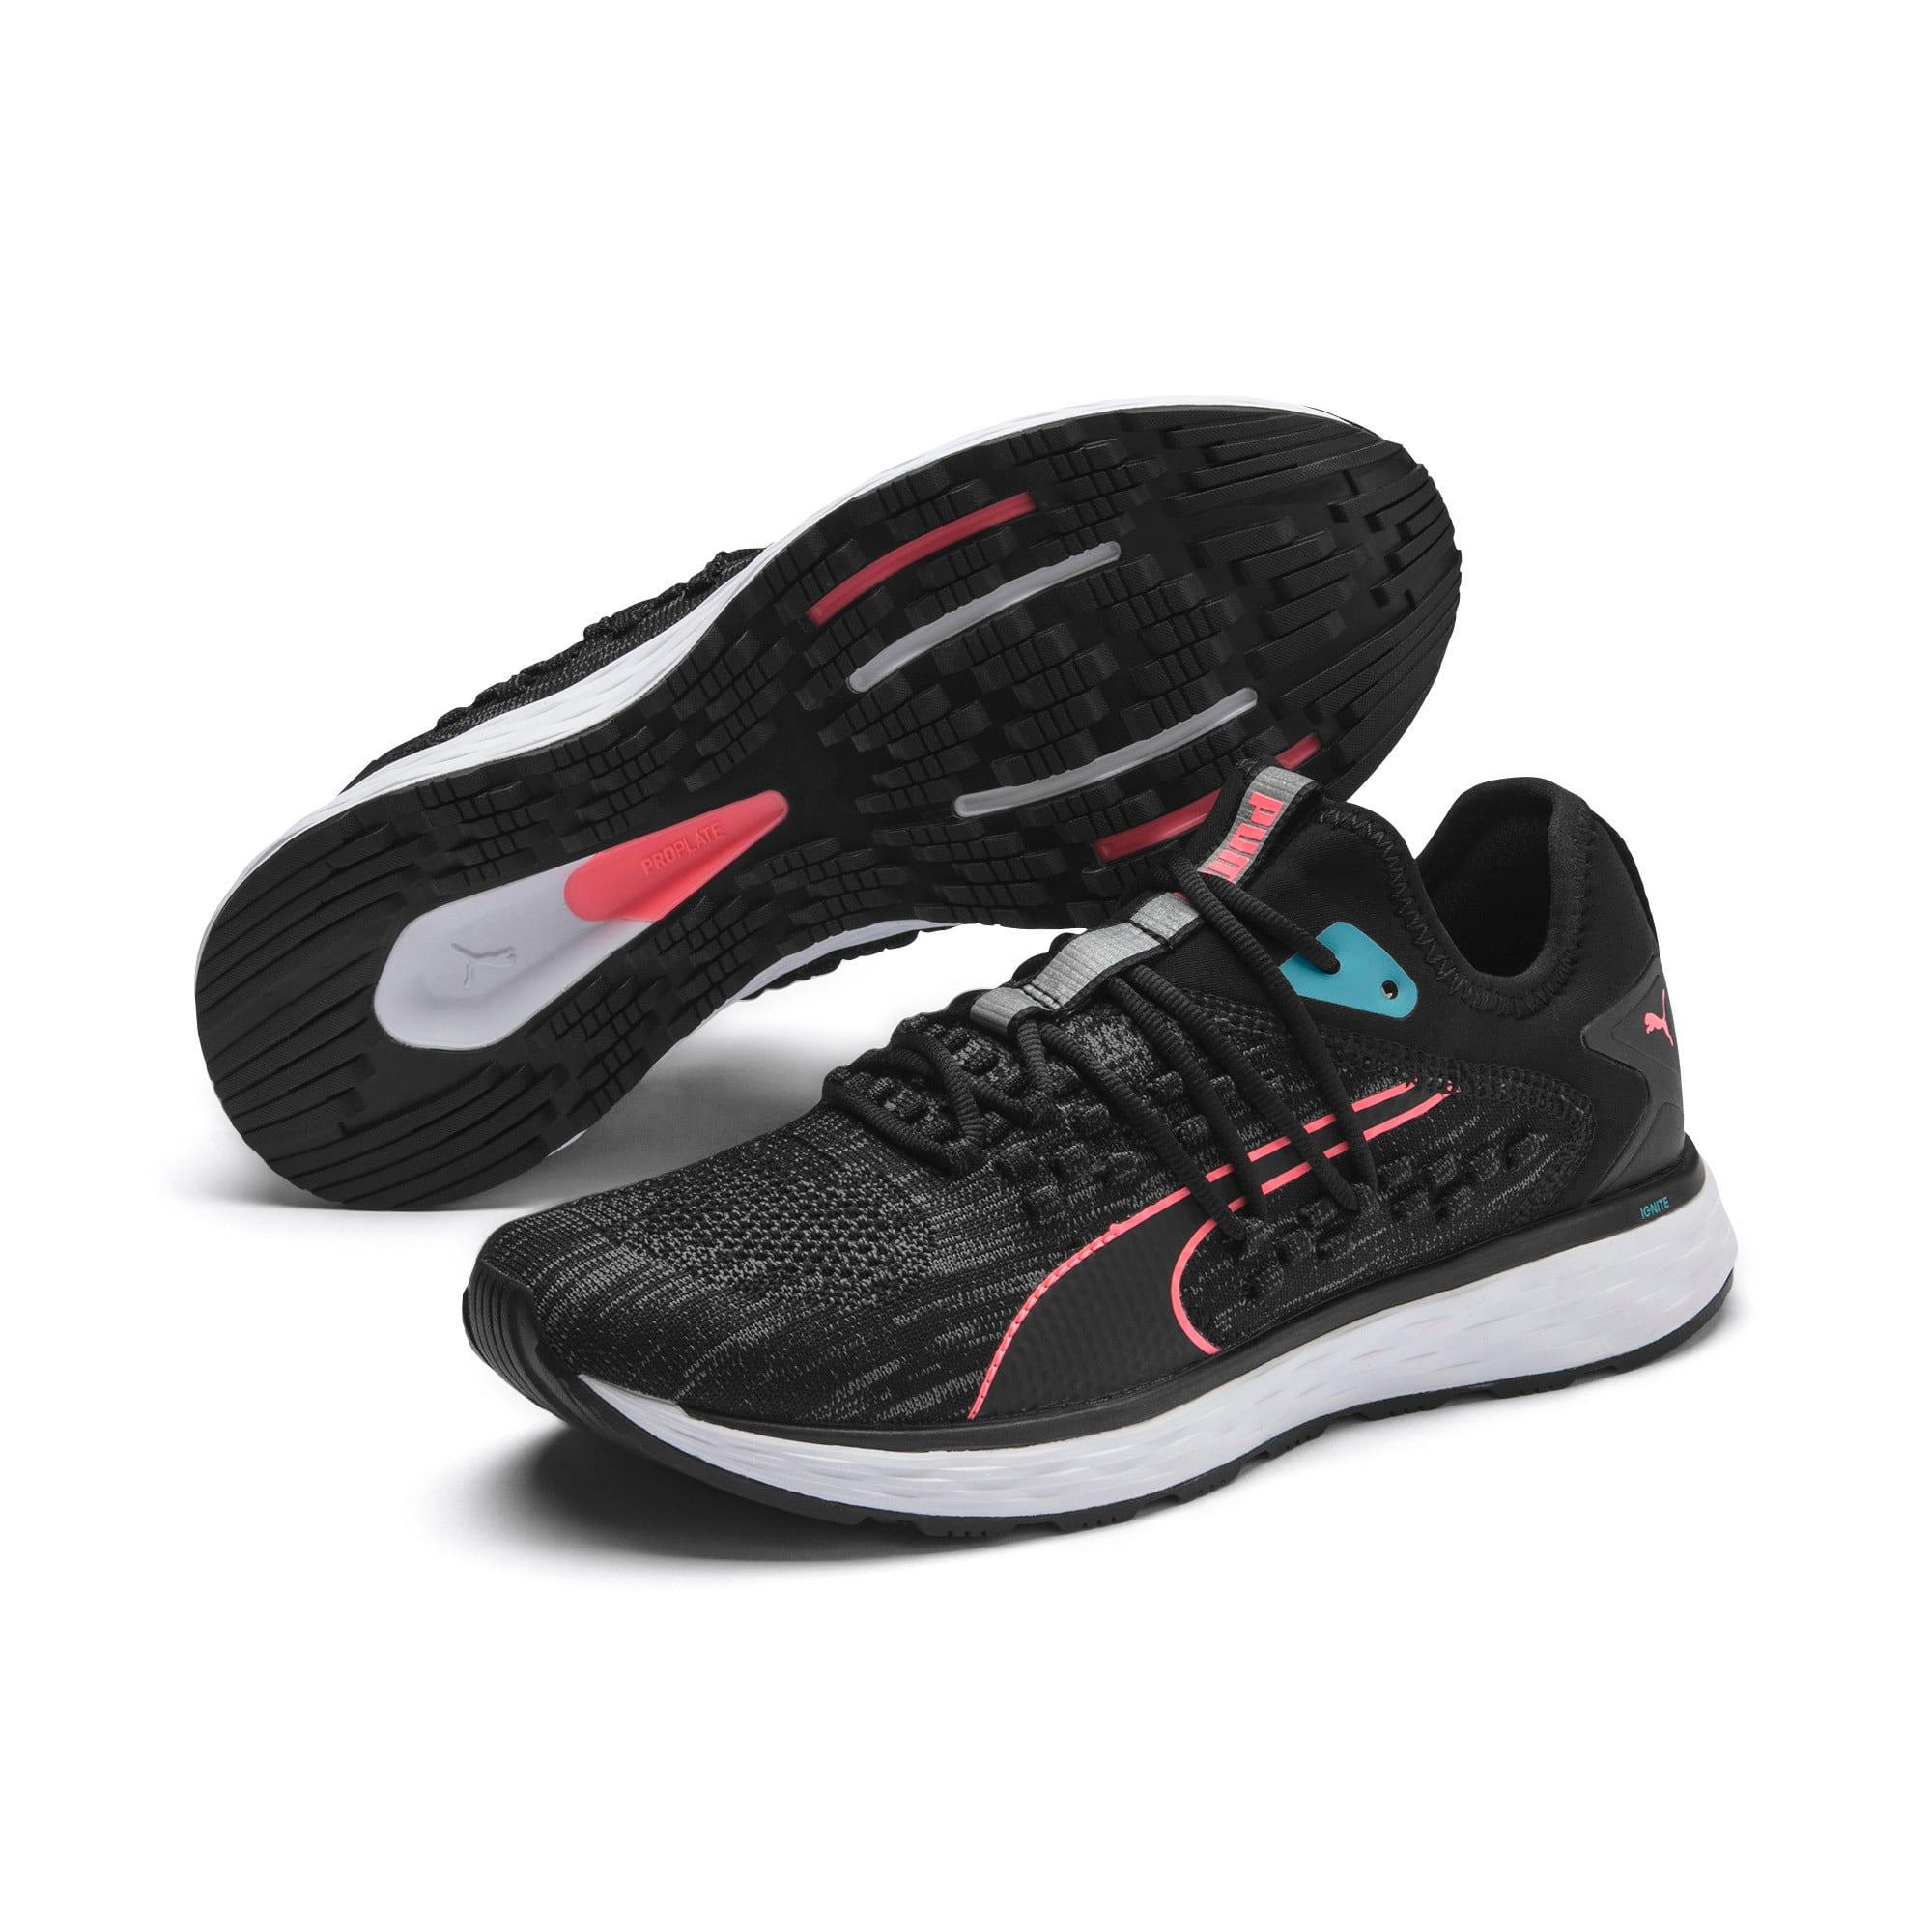 Thumbnail 4 of SPEED FUSEFIT Women's Running Shoes, Puma Black-Milky Blue, medium-IND